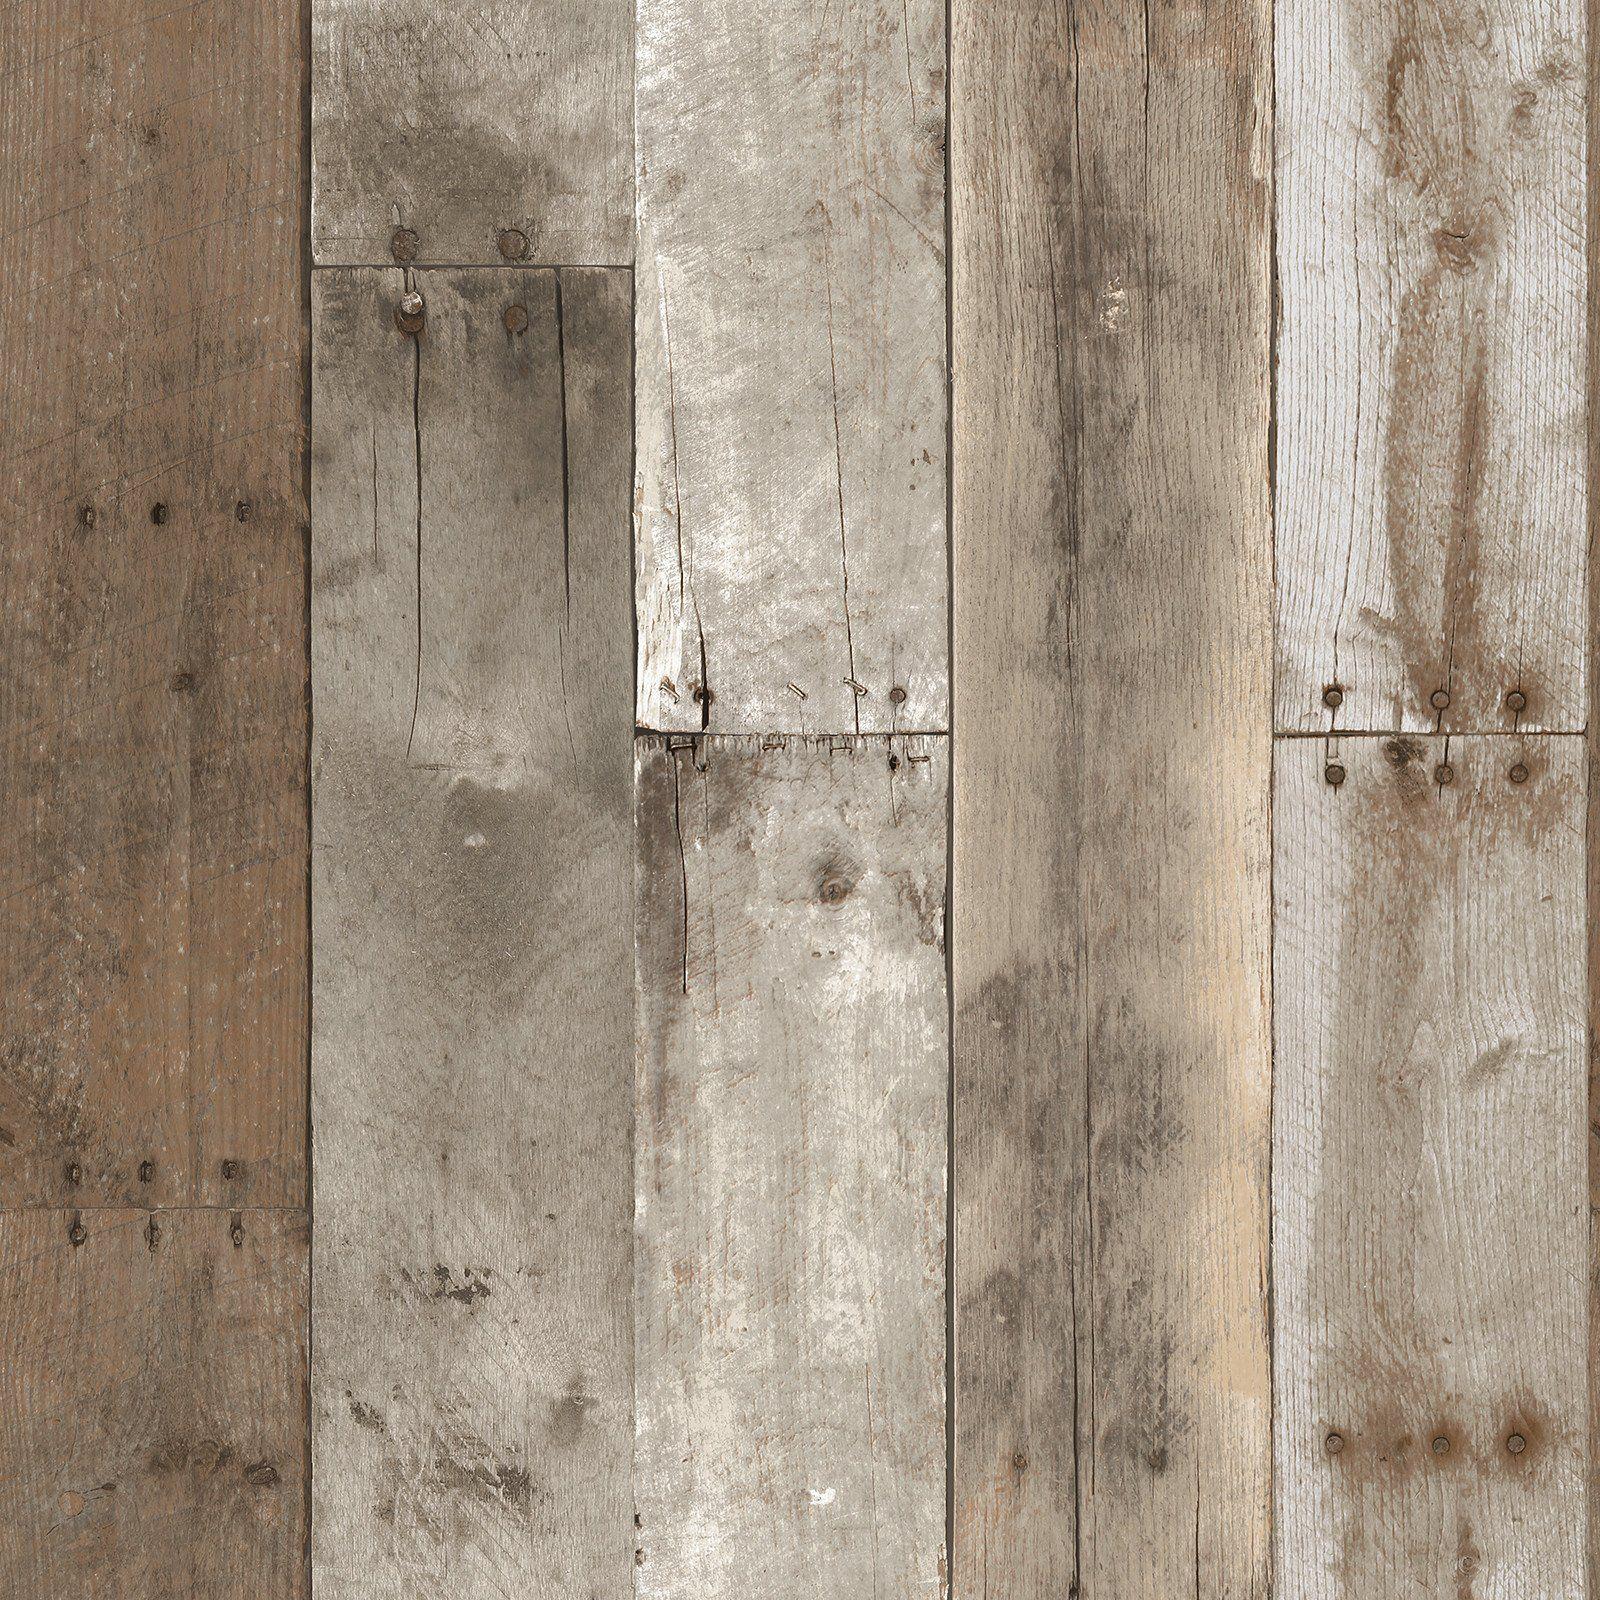 Sample Repurposed Wood Weathered Textured Self Adhesive Wallpaper By T Duvar Kagidi Duvar Dekor